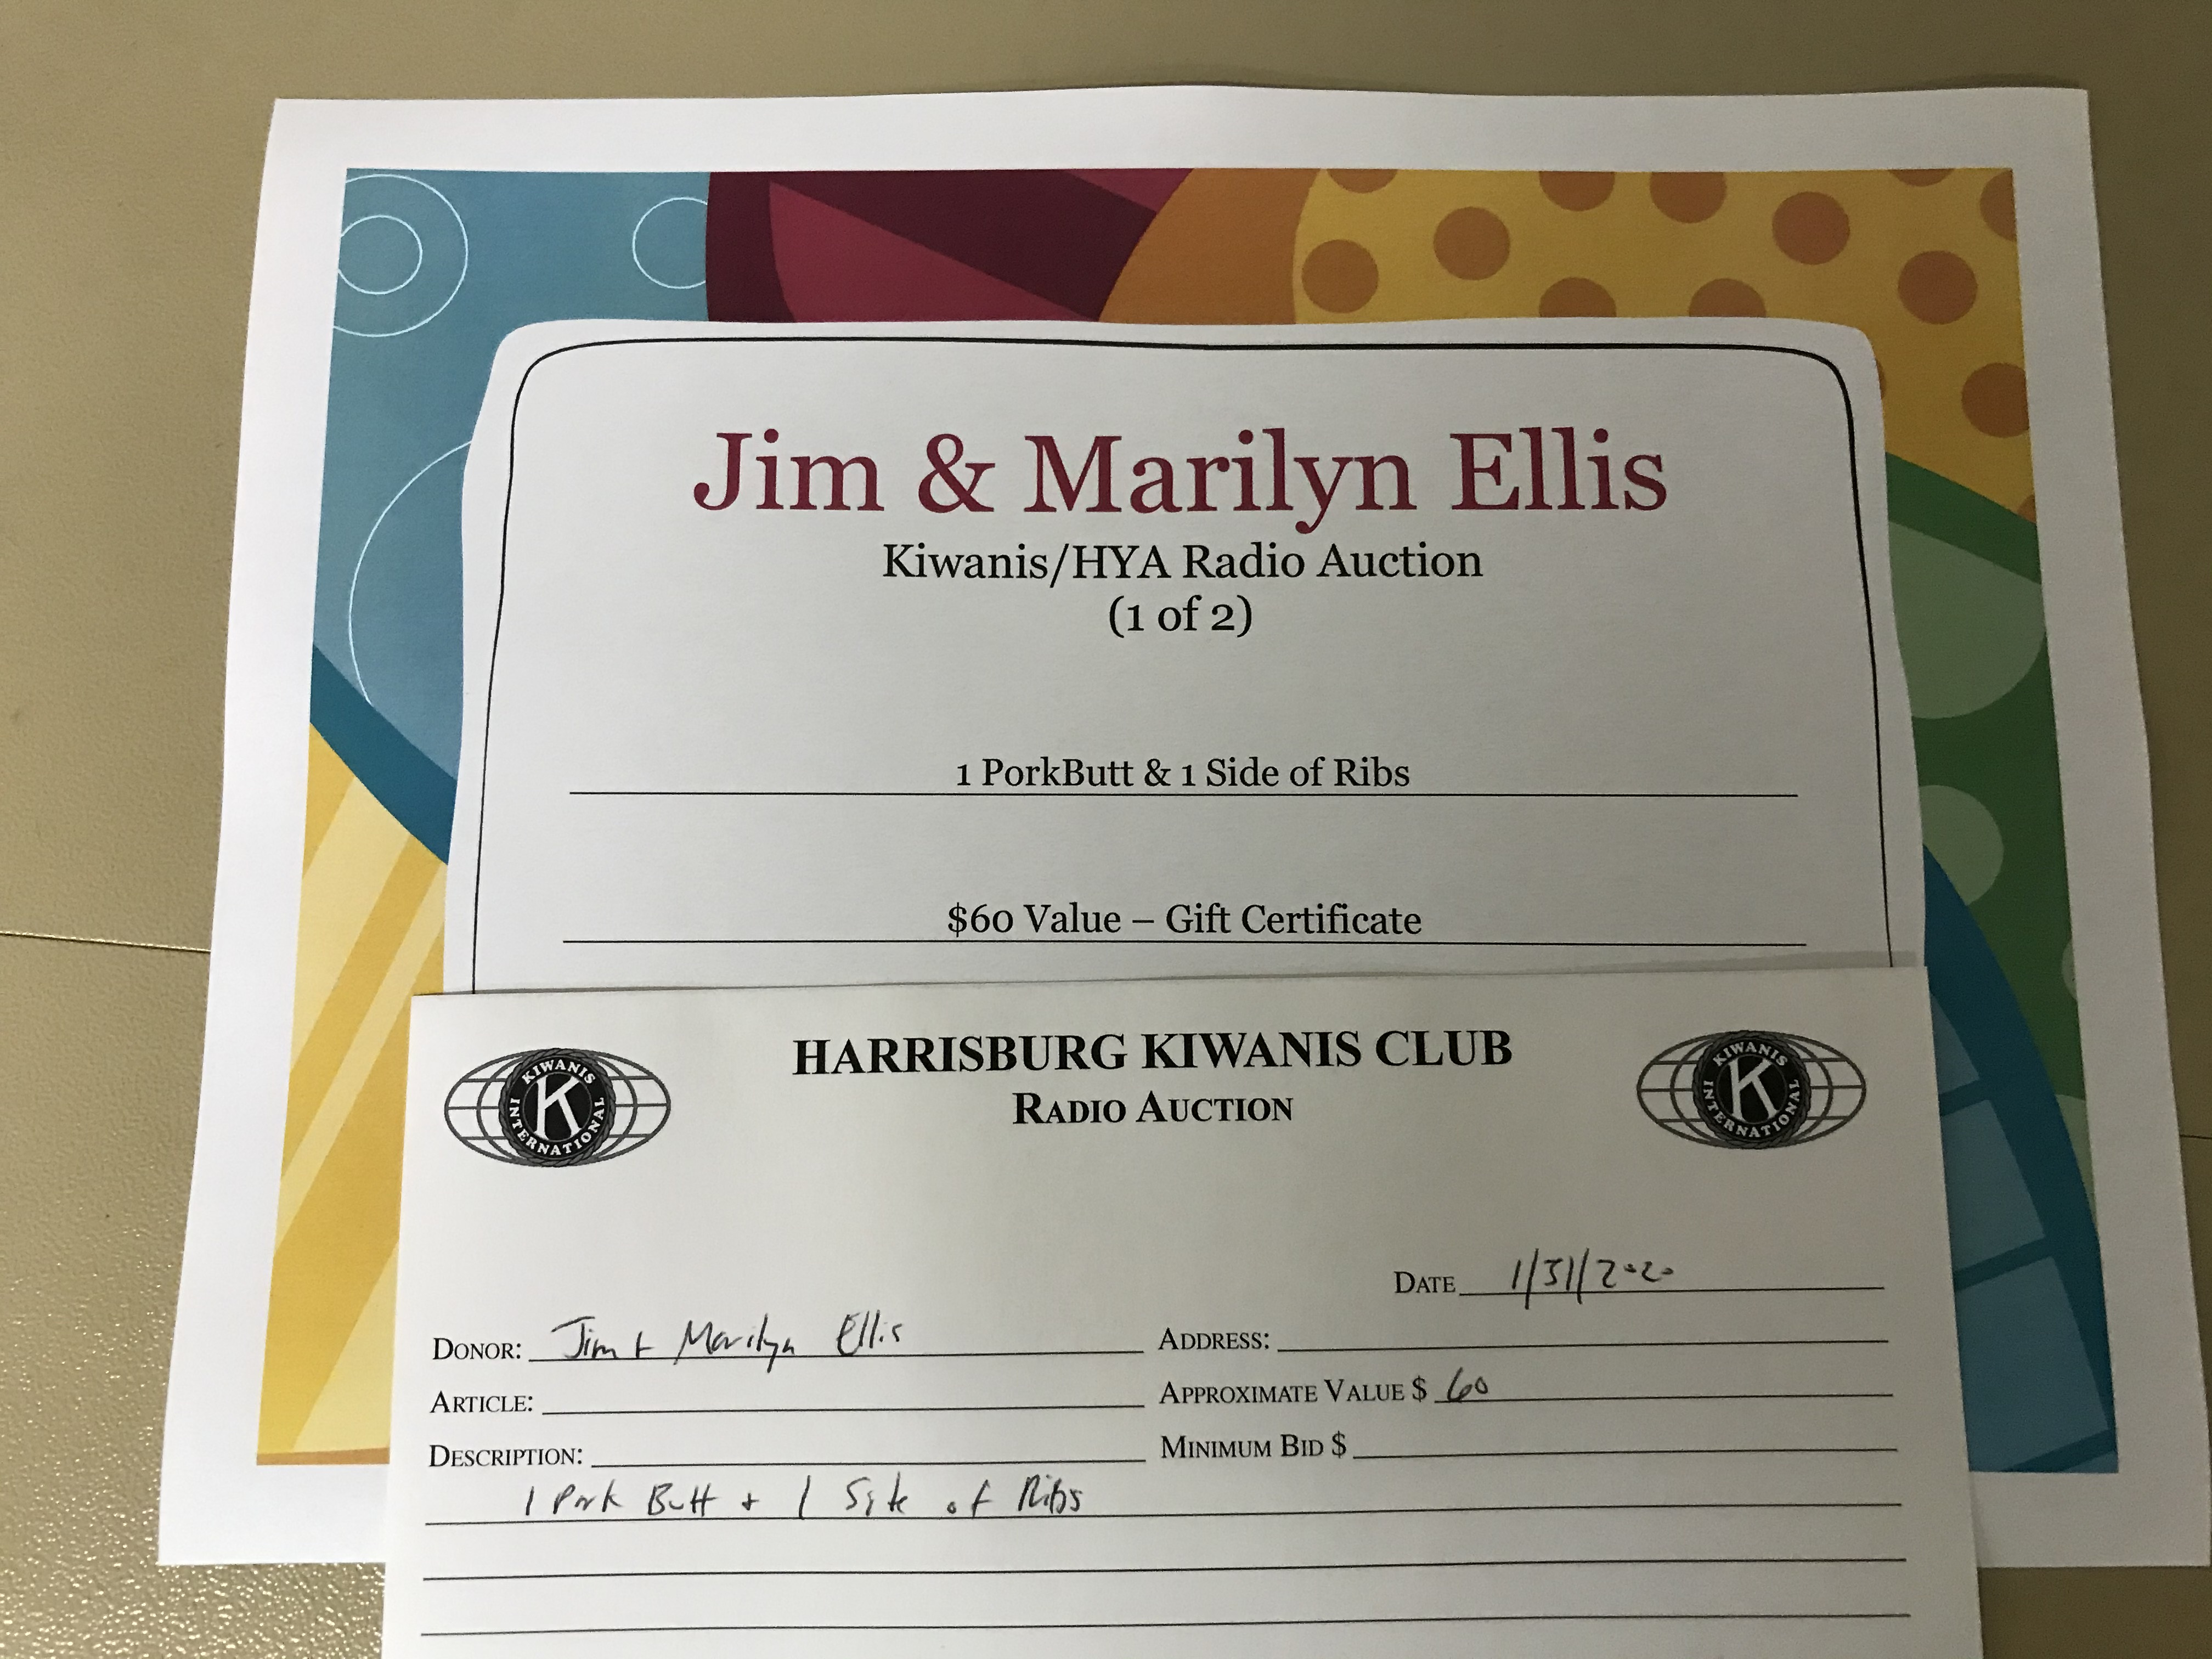 Item 428 - Jim & Marilyn Ellis 1 Pork Butt & 1 Side of Ribs